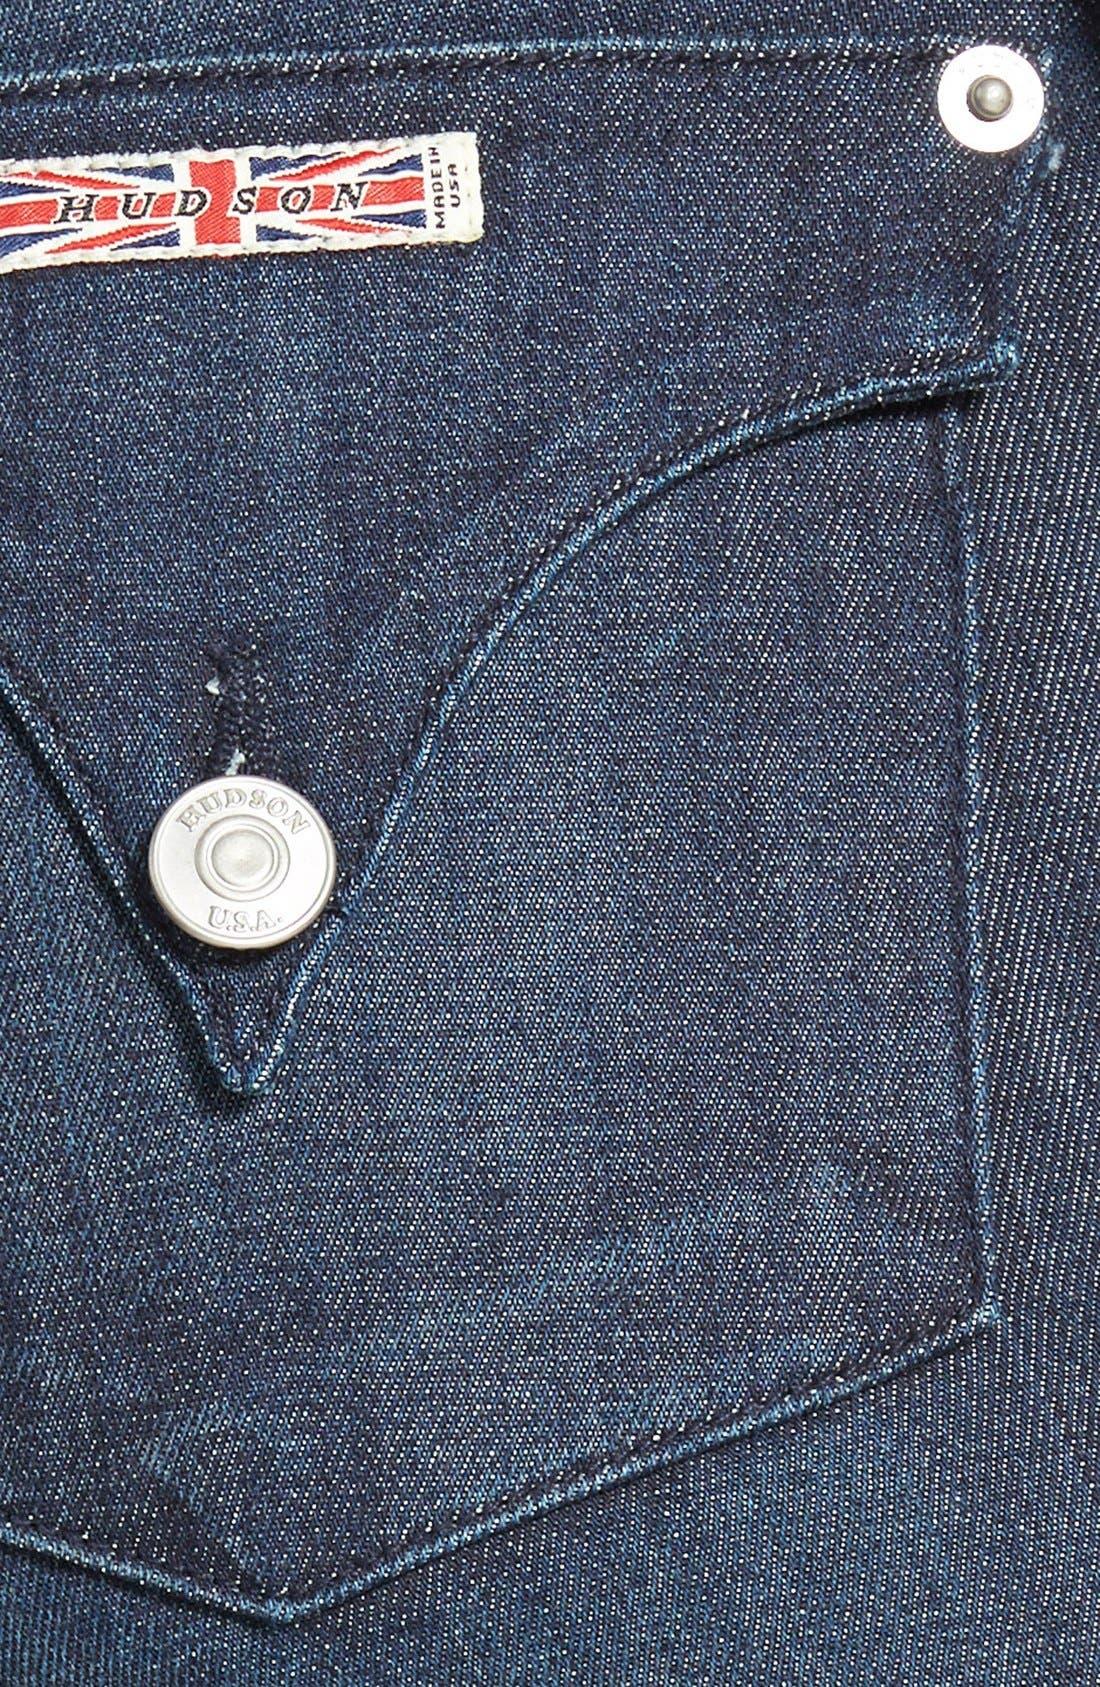 Alternate Image 3  - Hudson Jeans 'Lynn' Ultra Skinny Jeans (Stella 2)